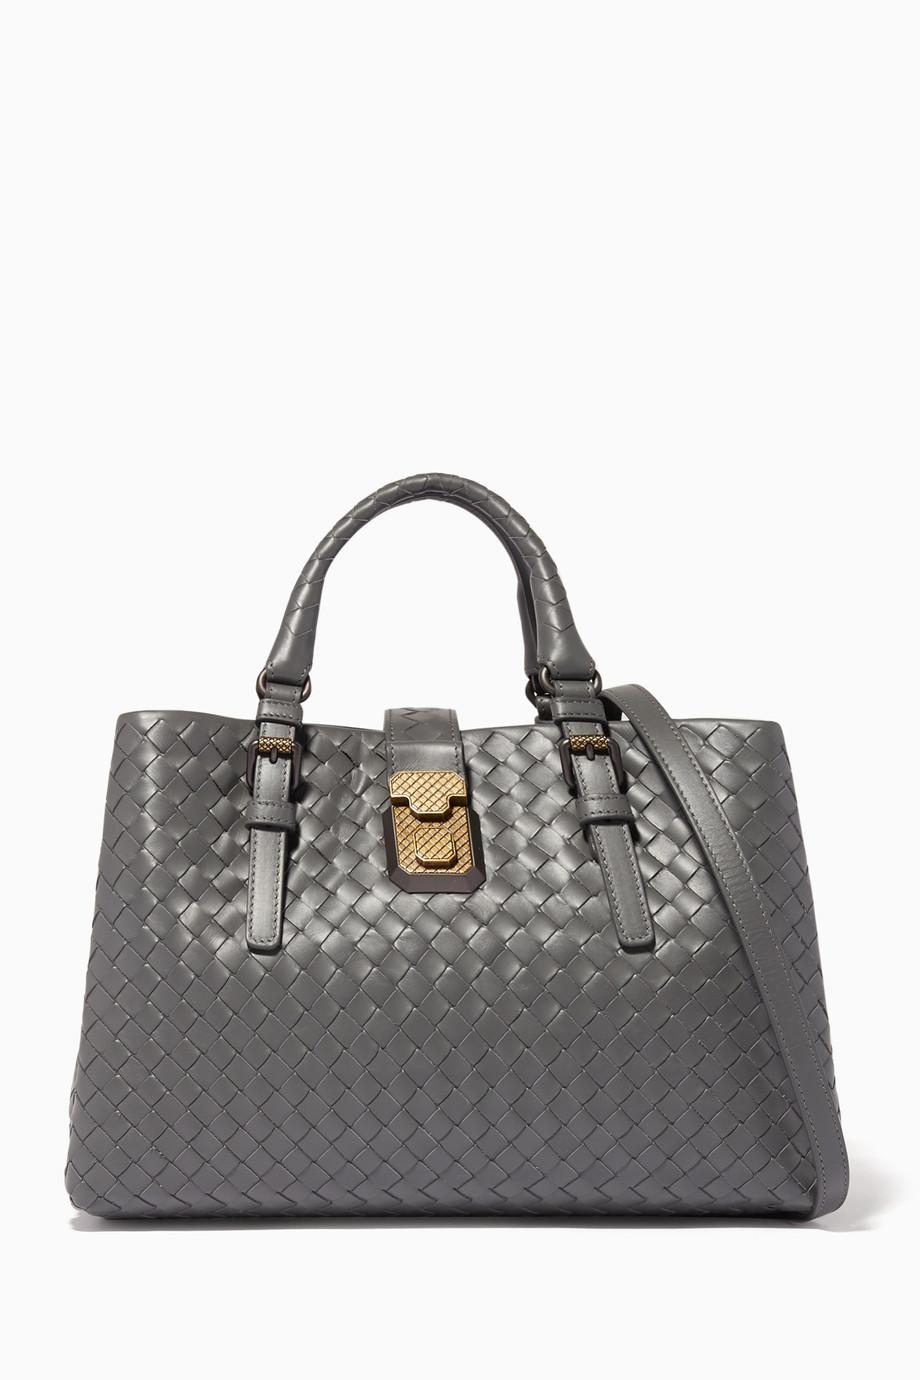 14e2a9d1e8c8 Shop Bottega Veneta Grey Light-Grey Small Roma Intrecciato Leather Tote Bag  for Women